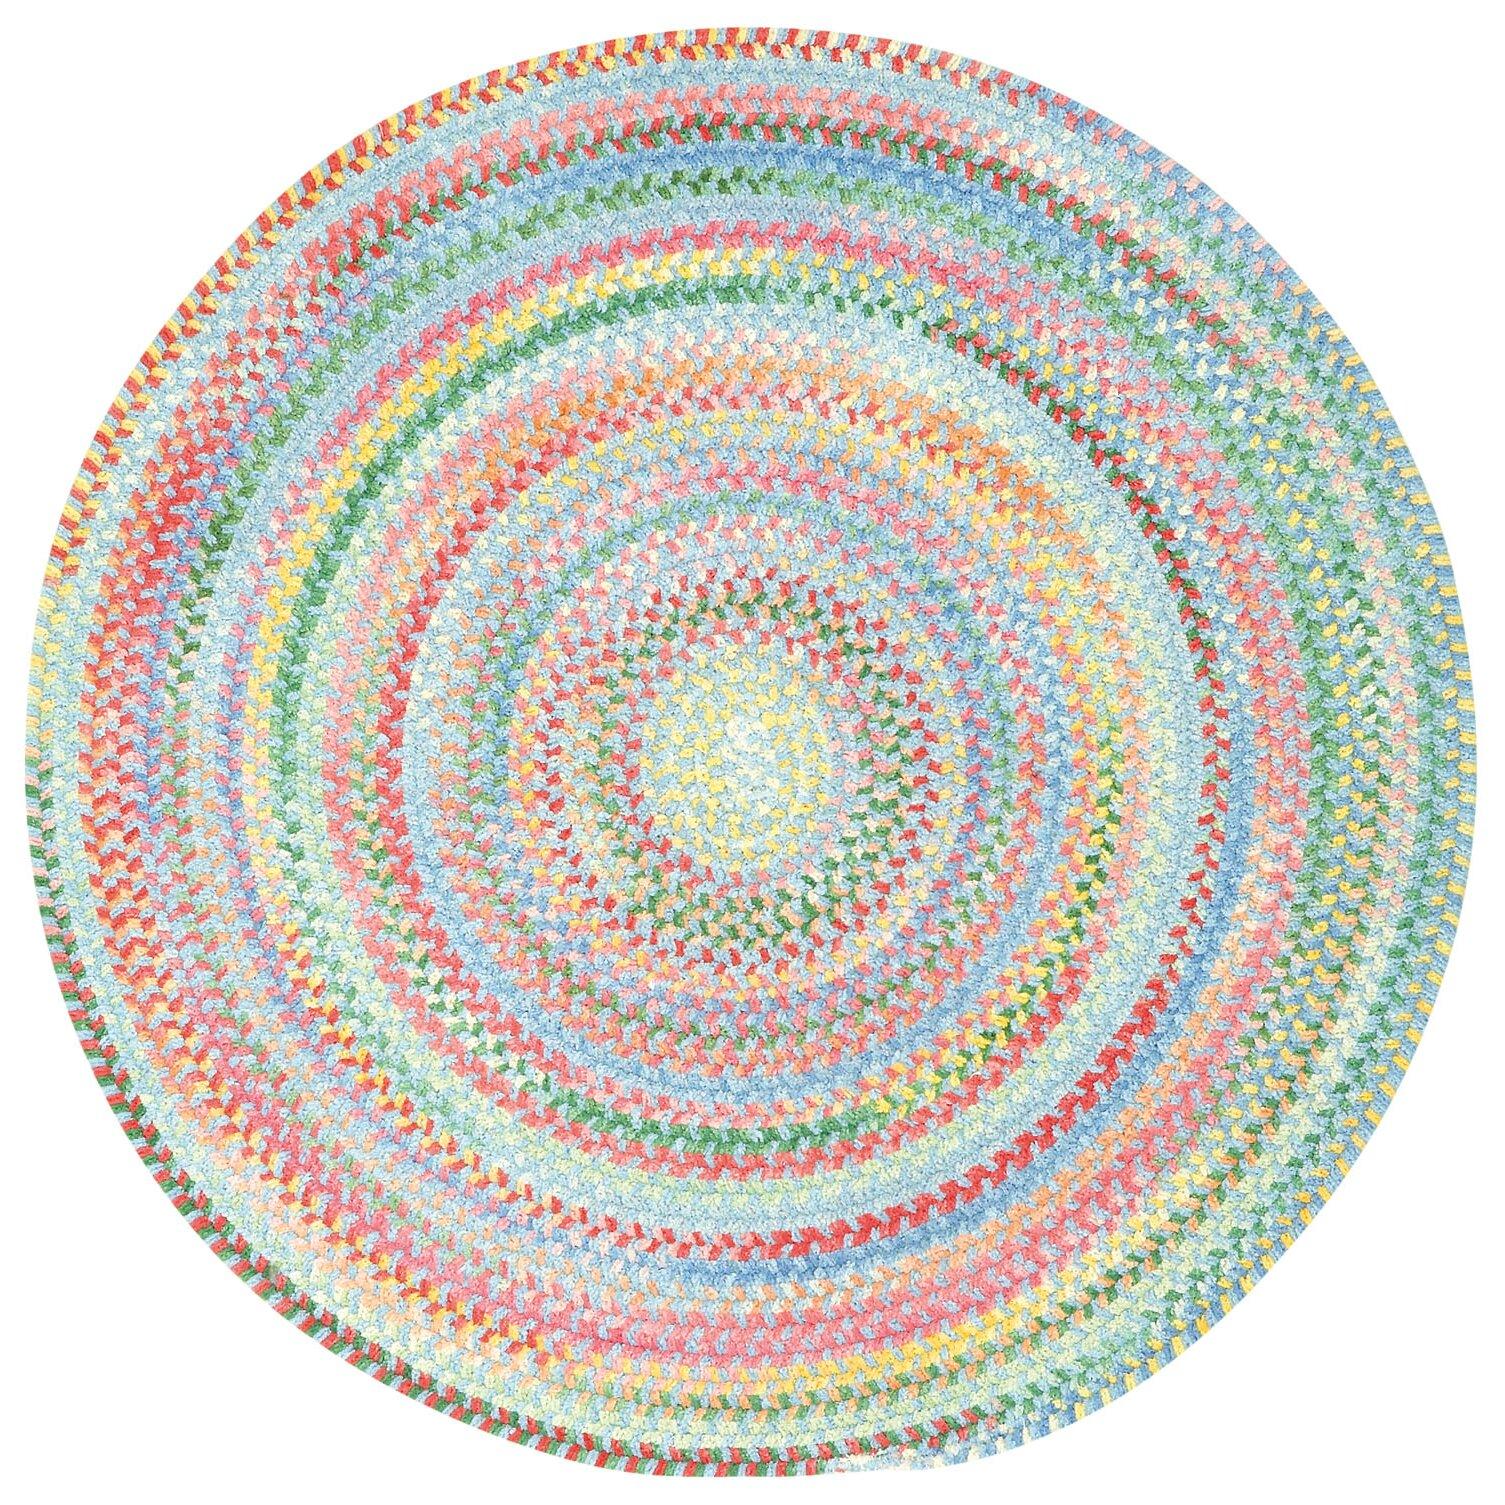 capel baby 39 s breath pink blue area rug reviews wayfair. Black Bedroom Furniture Sets. Home Design Ideas